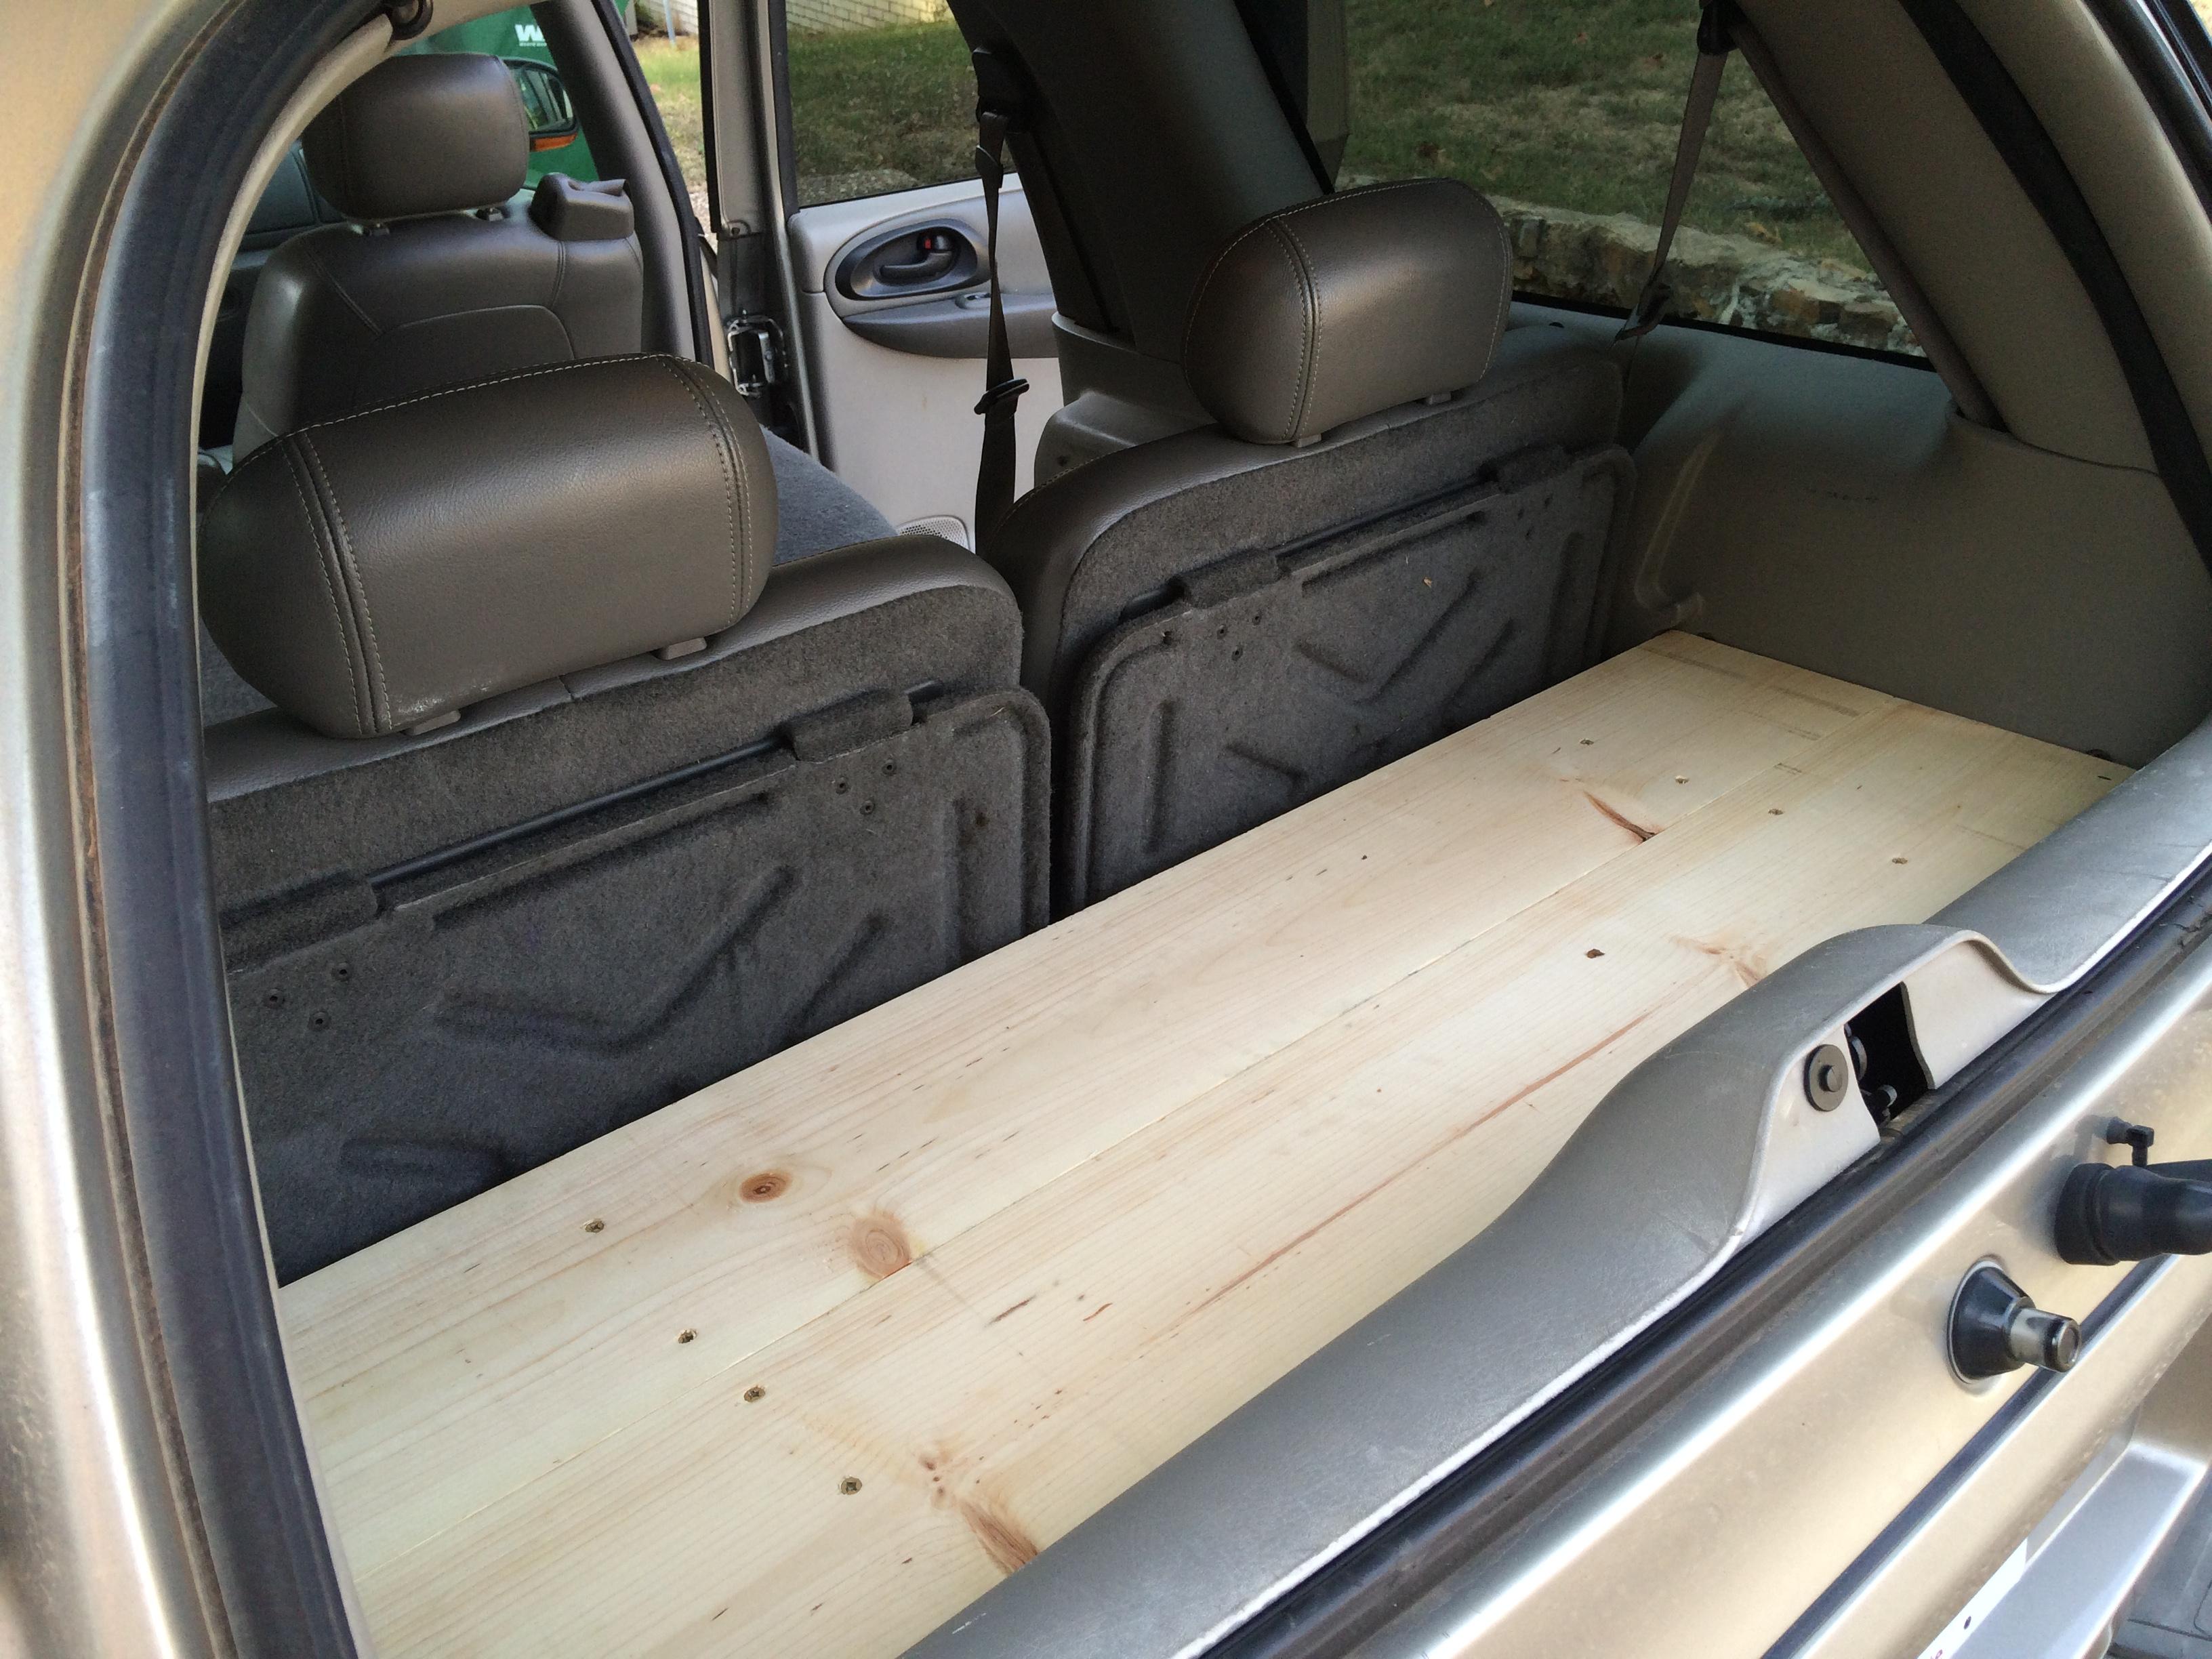 2015 Chevy Trailblazer >> 14 Diy Cargo Shelf For Chevy Trailblazer Rob Mcbryde